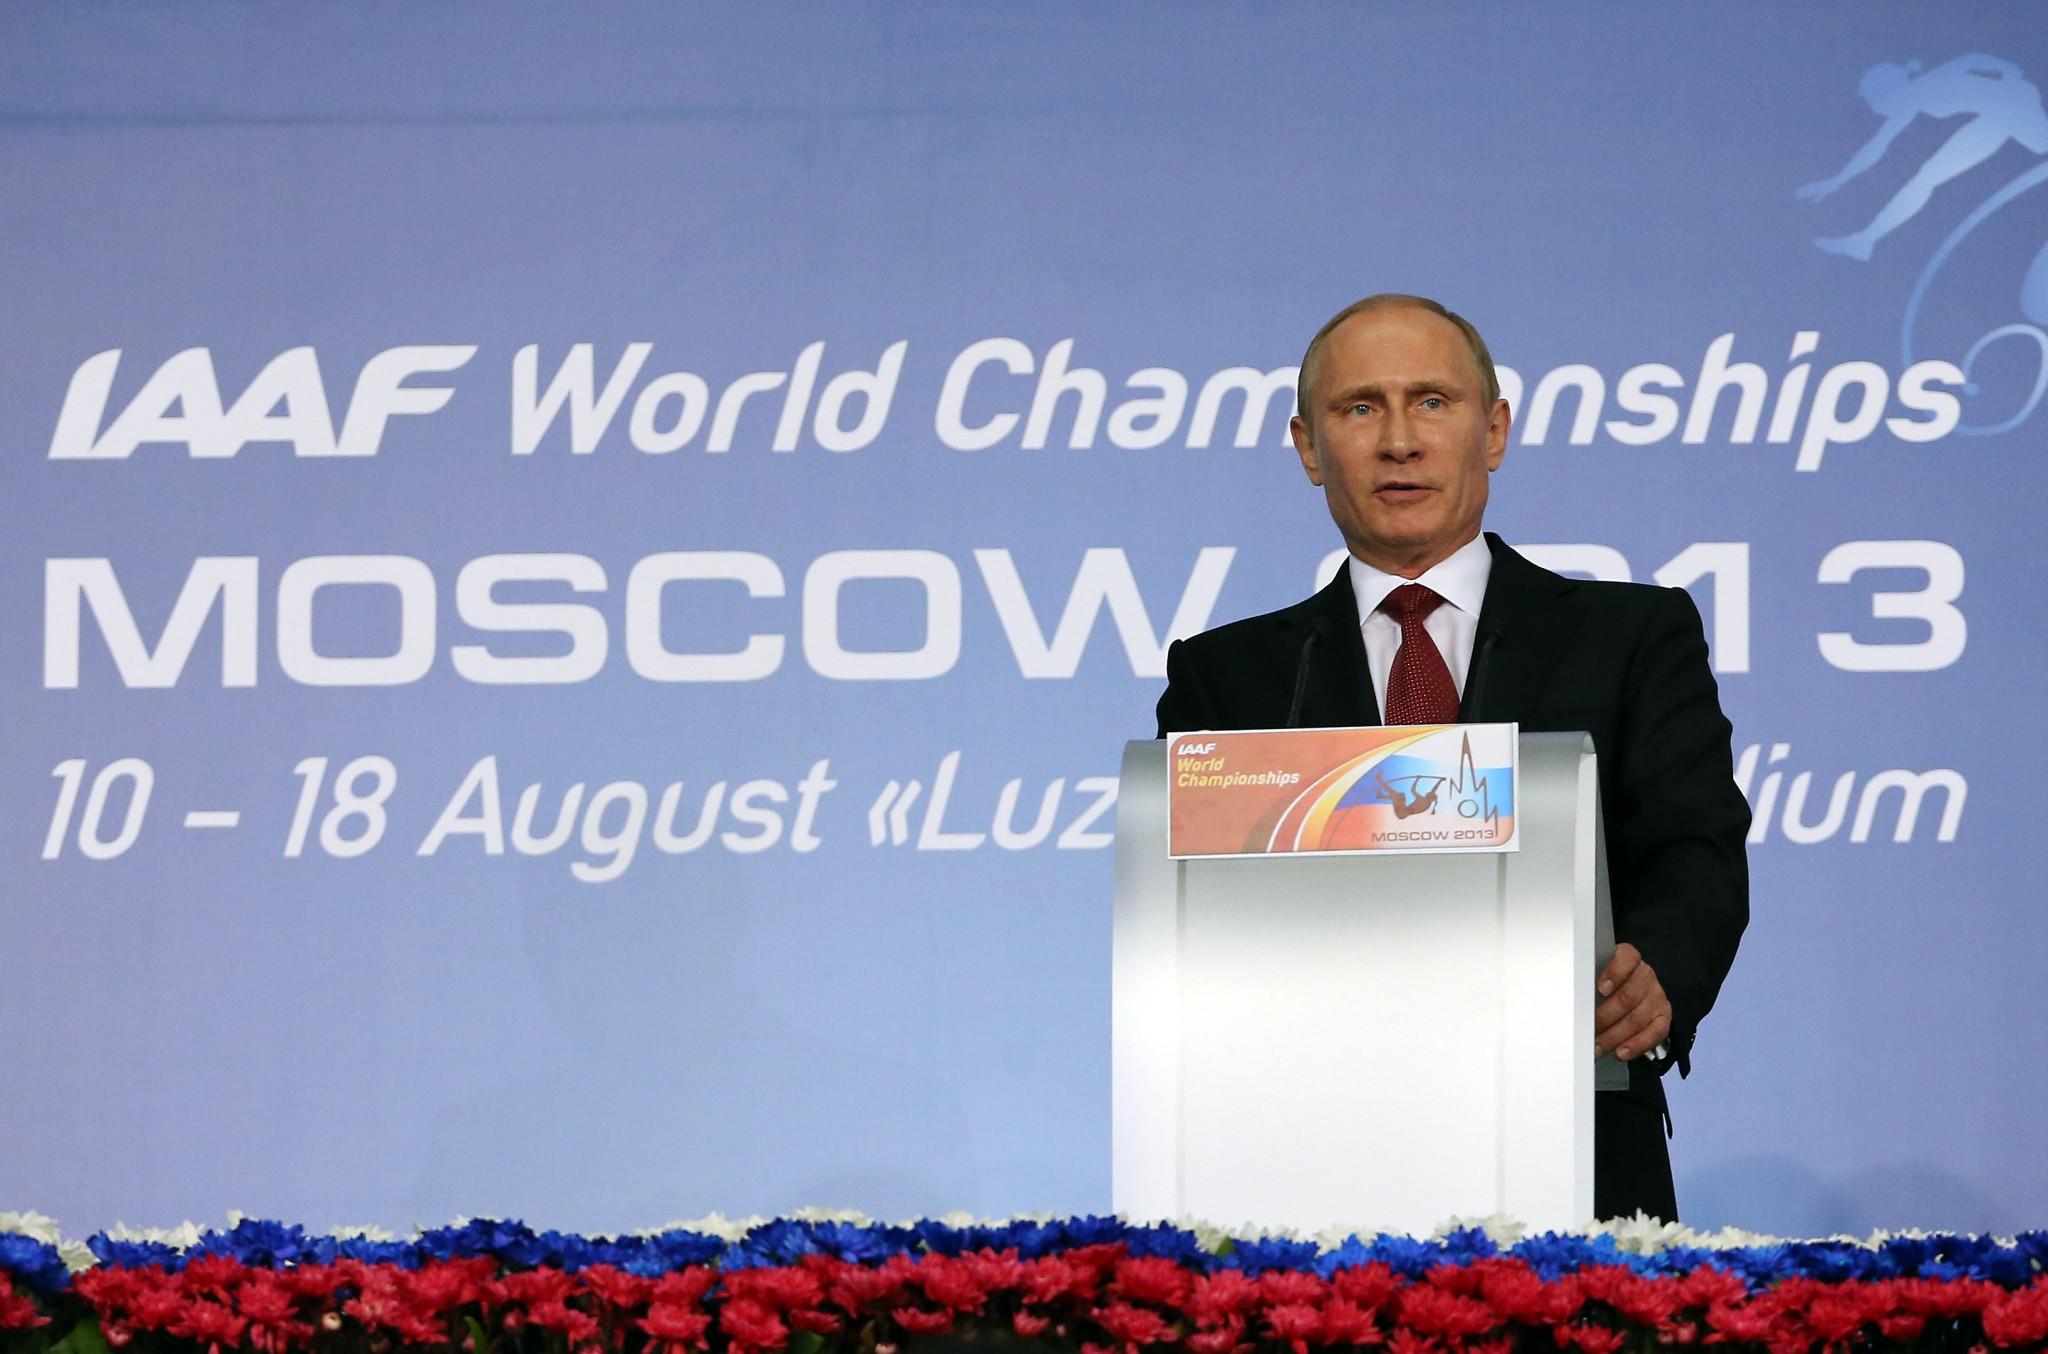 Russian world champions ask Putin to intervene in RusAF-World Athletics dispute